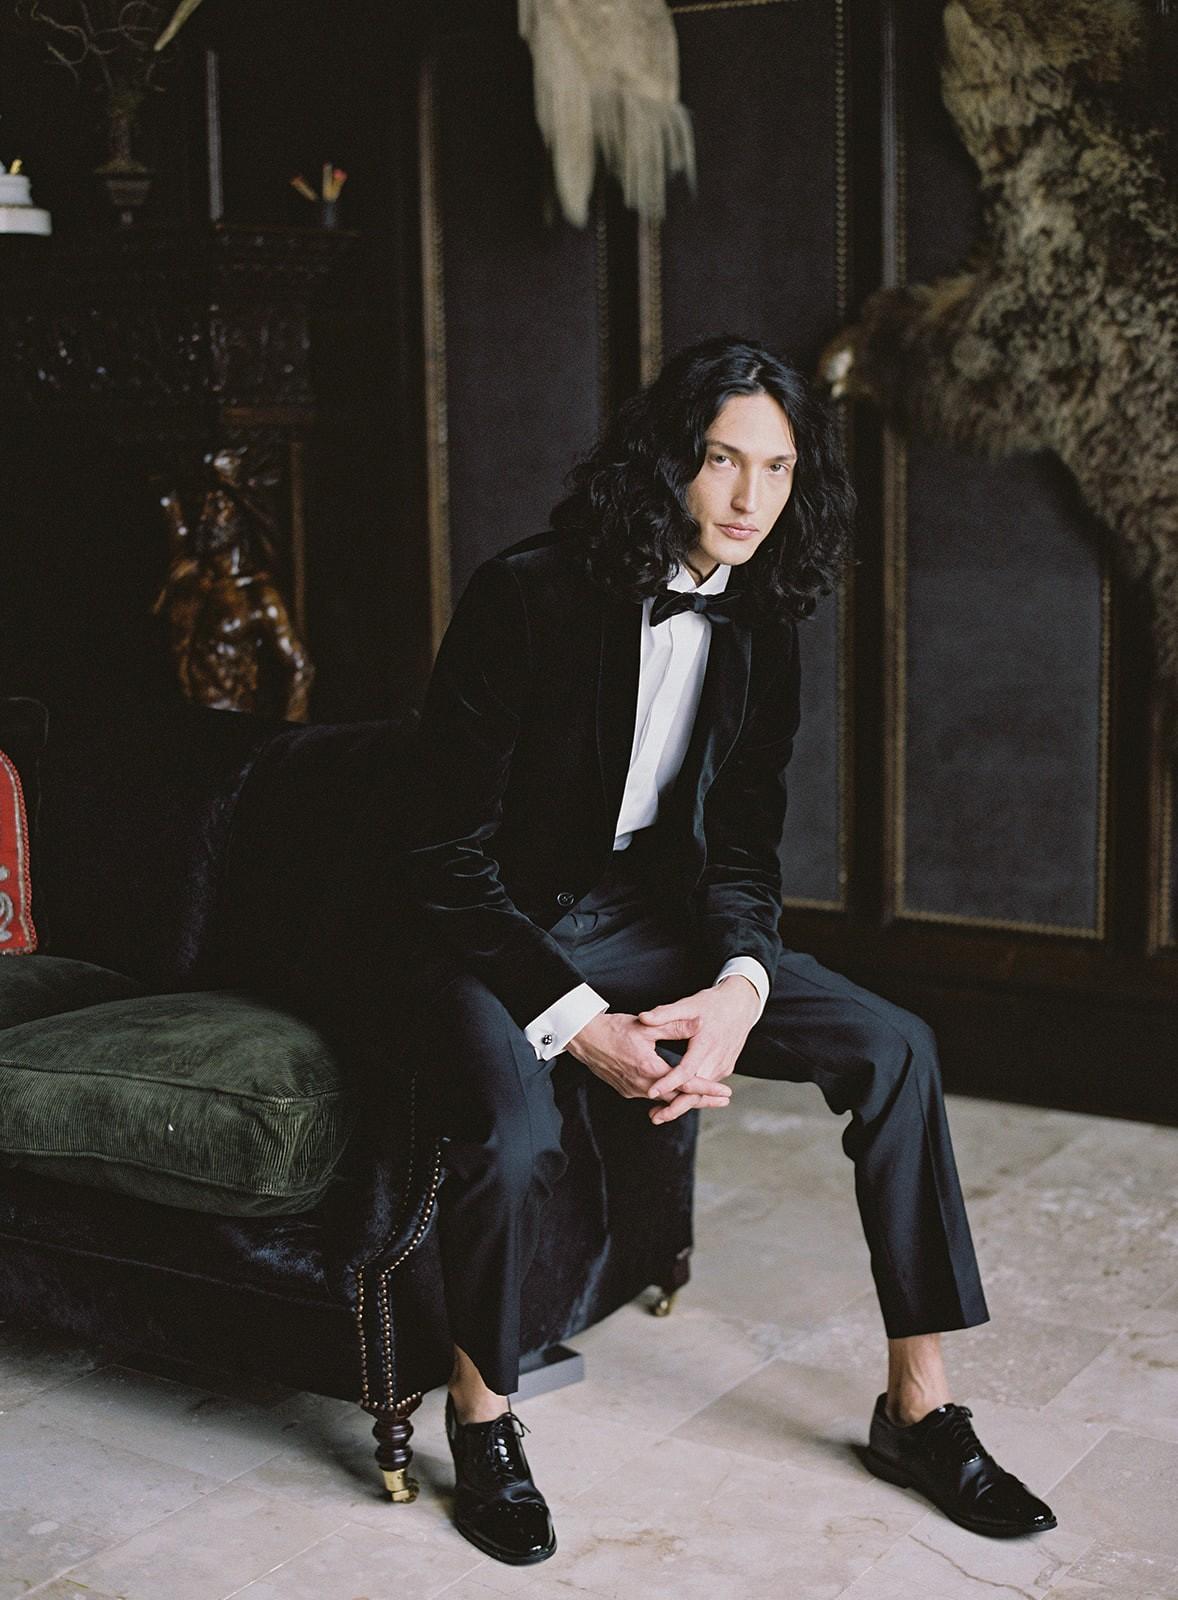 Written Desires - An Elegant & Luxurious Editorial at Dover Hall Estate